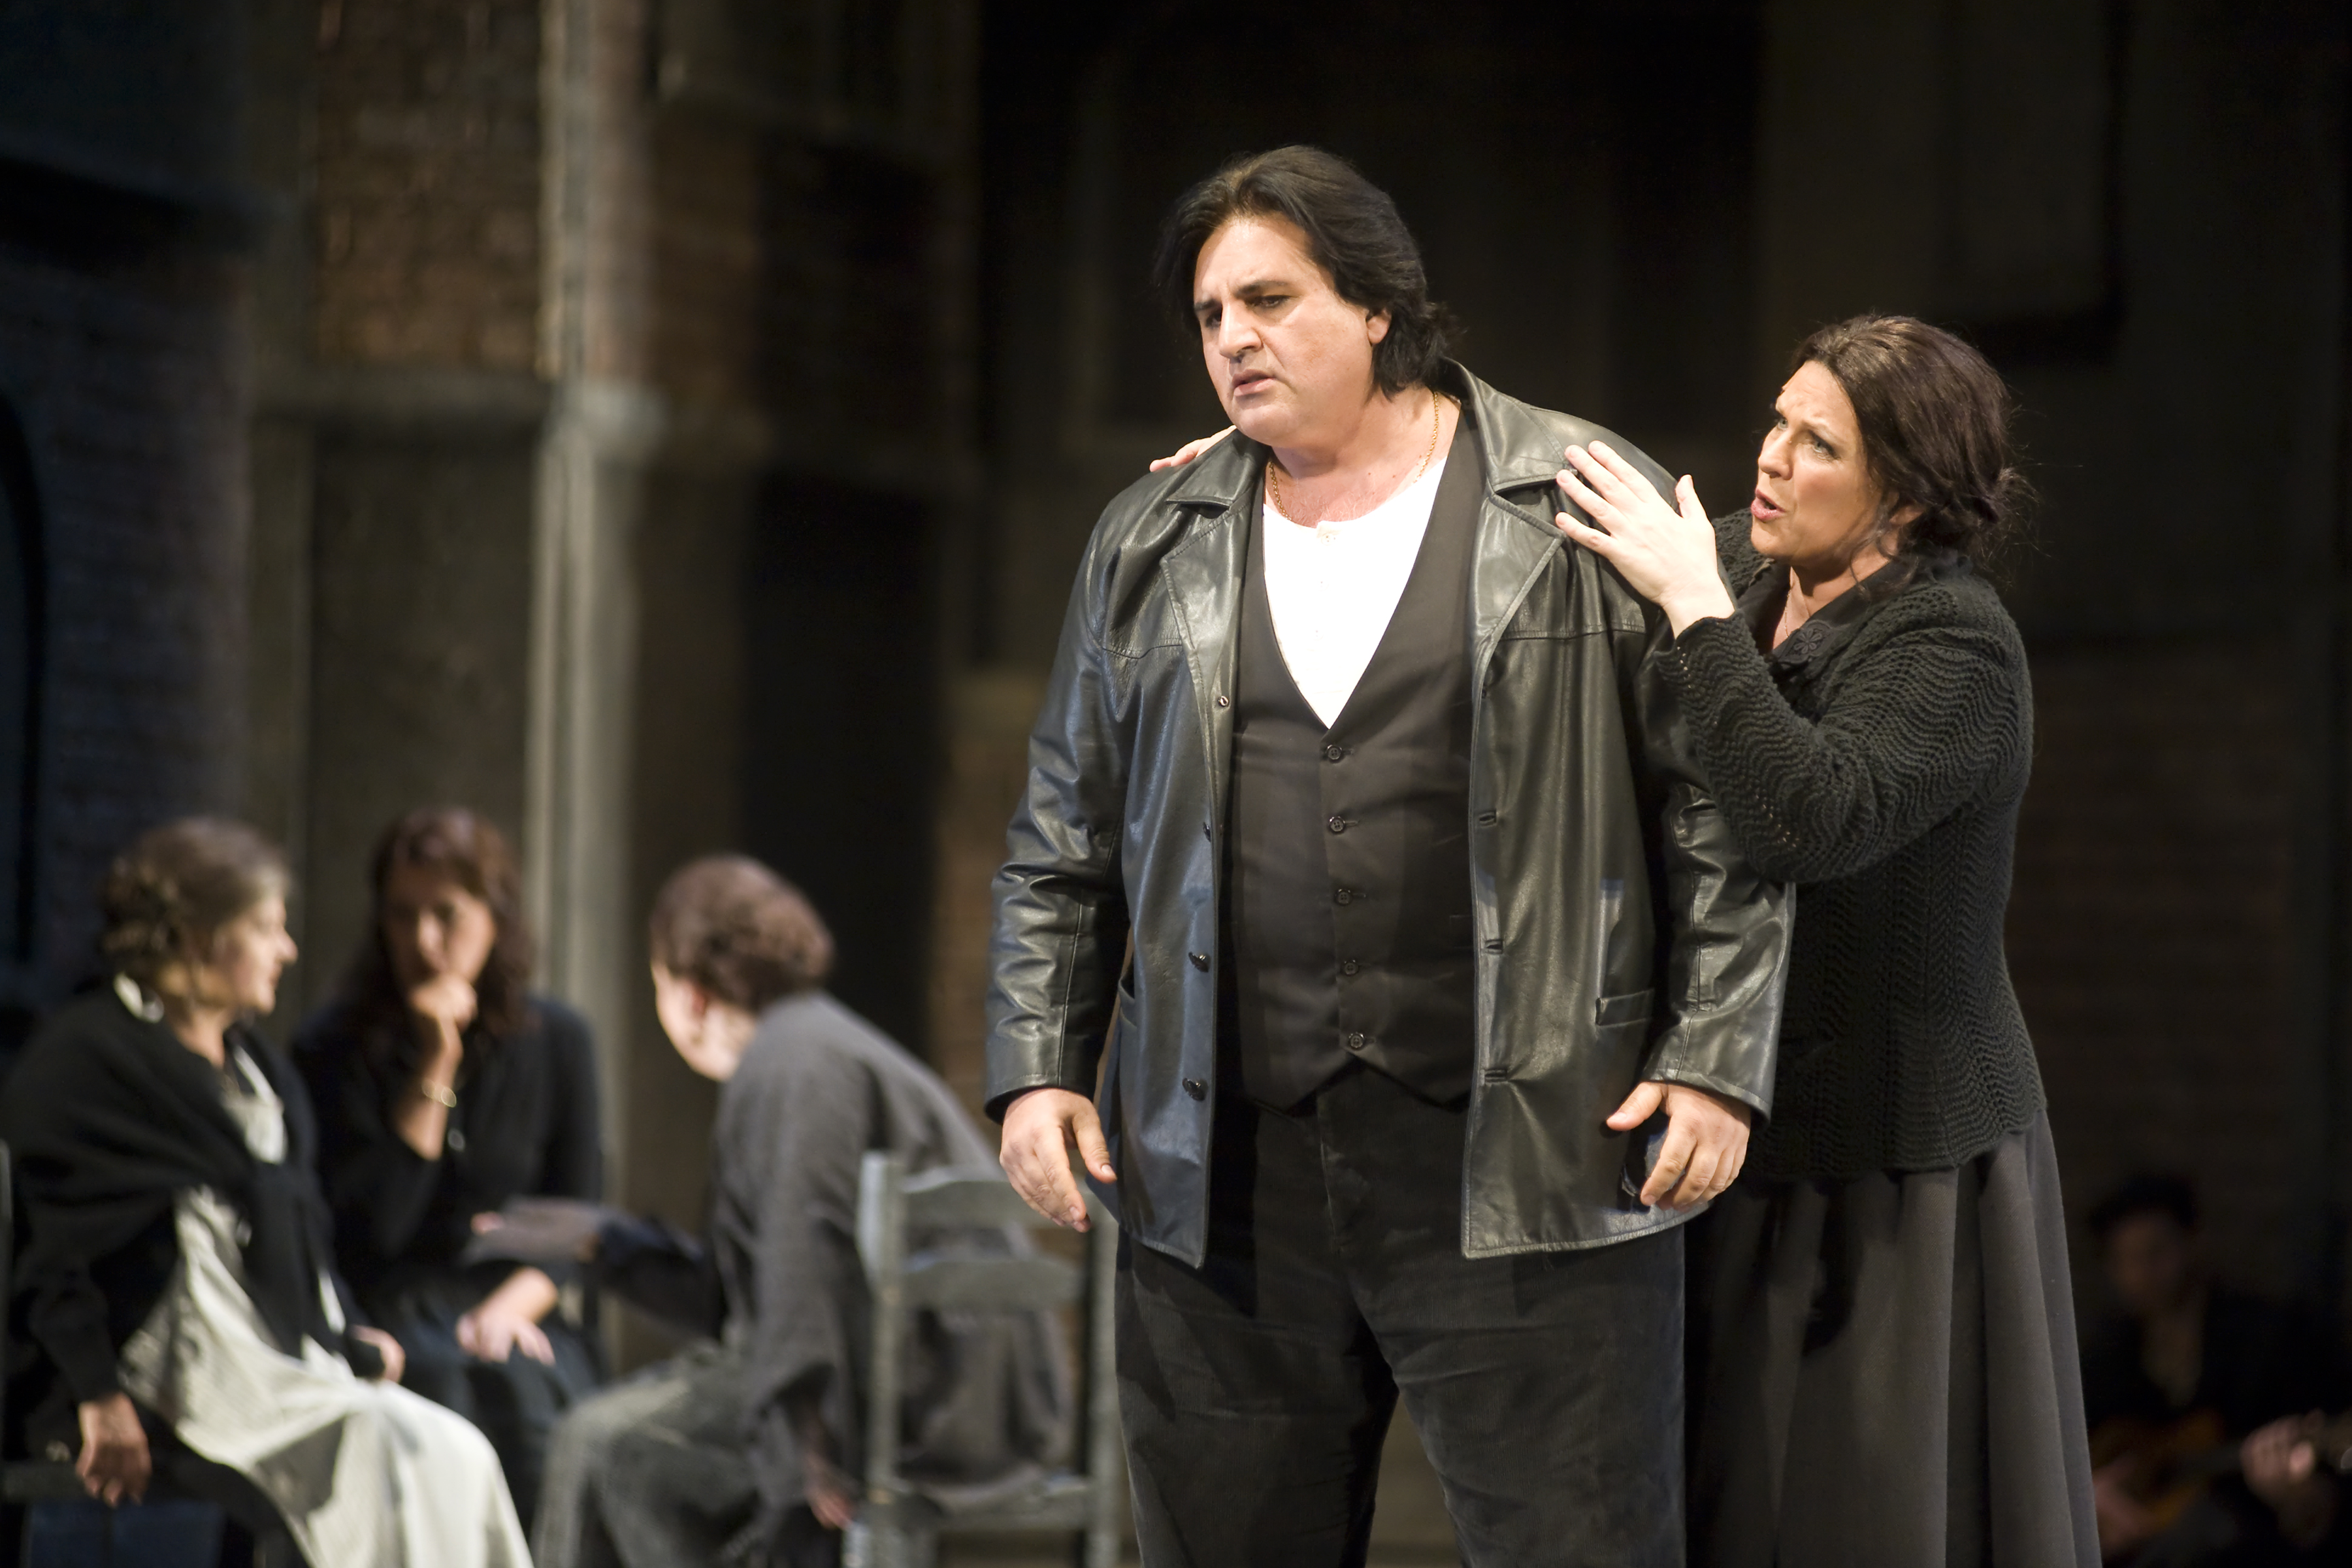 BWW Review: CAVALLERIA RUSTICANA AND I PAGLIACCI at Adelaide Festival Theatre